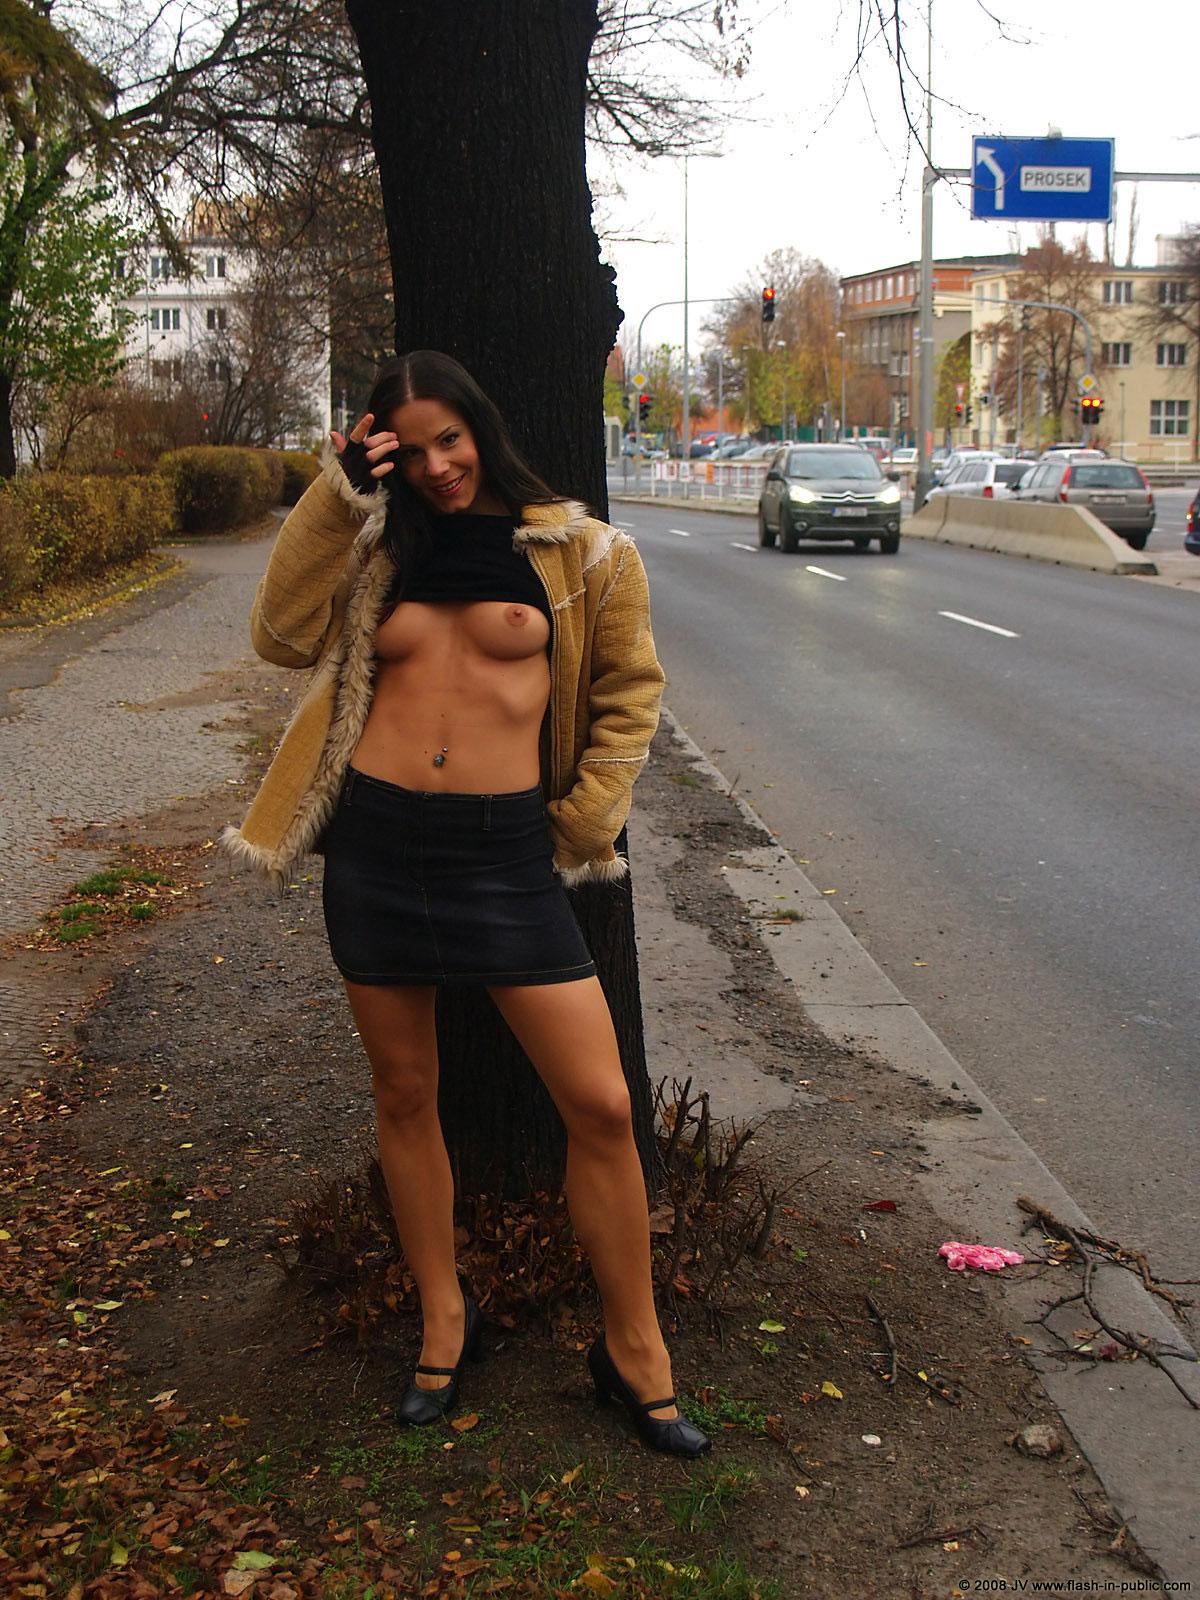 alexandra-g-bottomless-stockings-flash-in-public-22